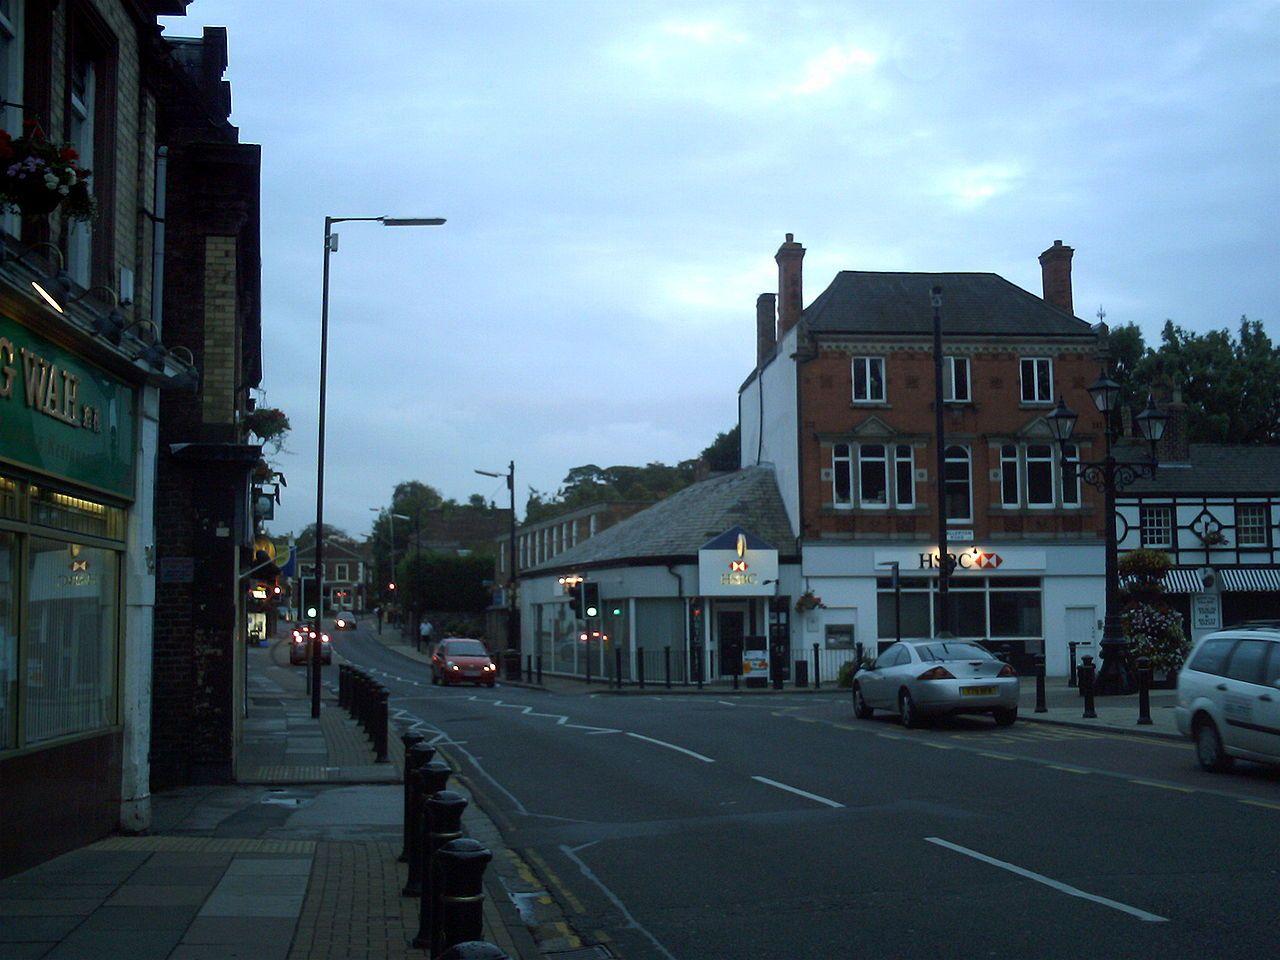 Woolton street